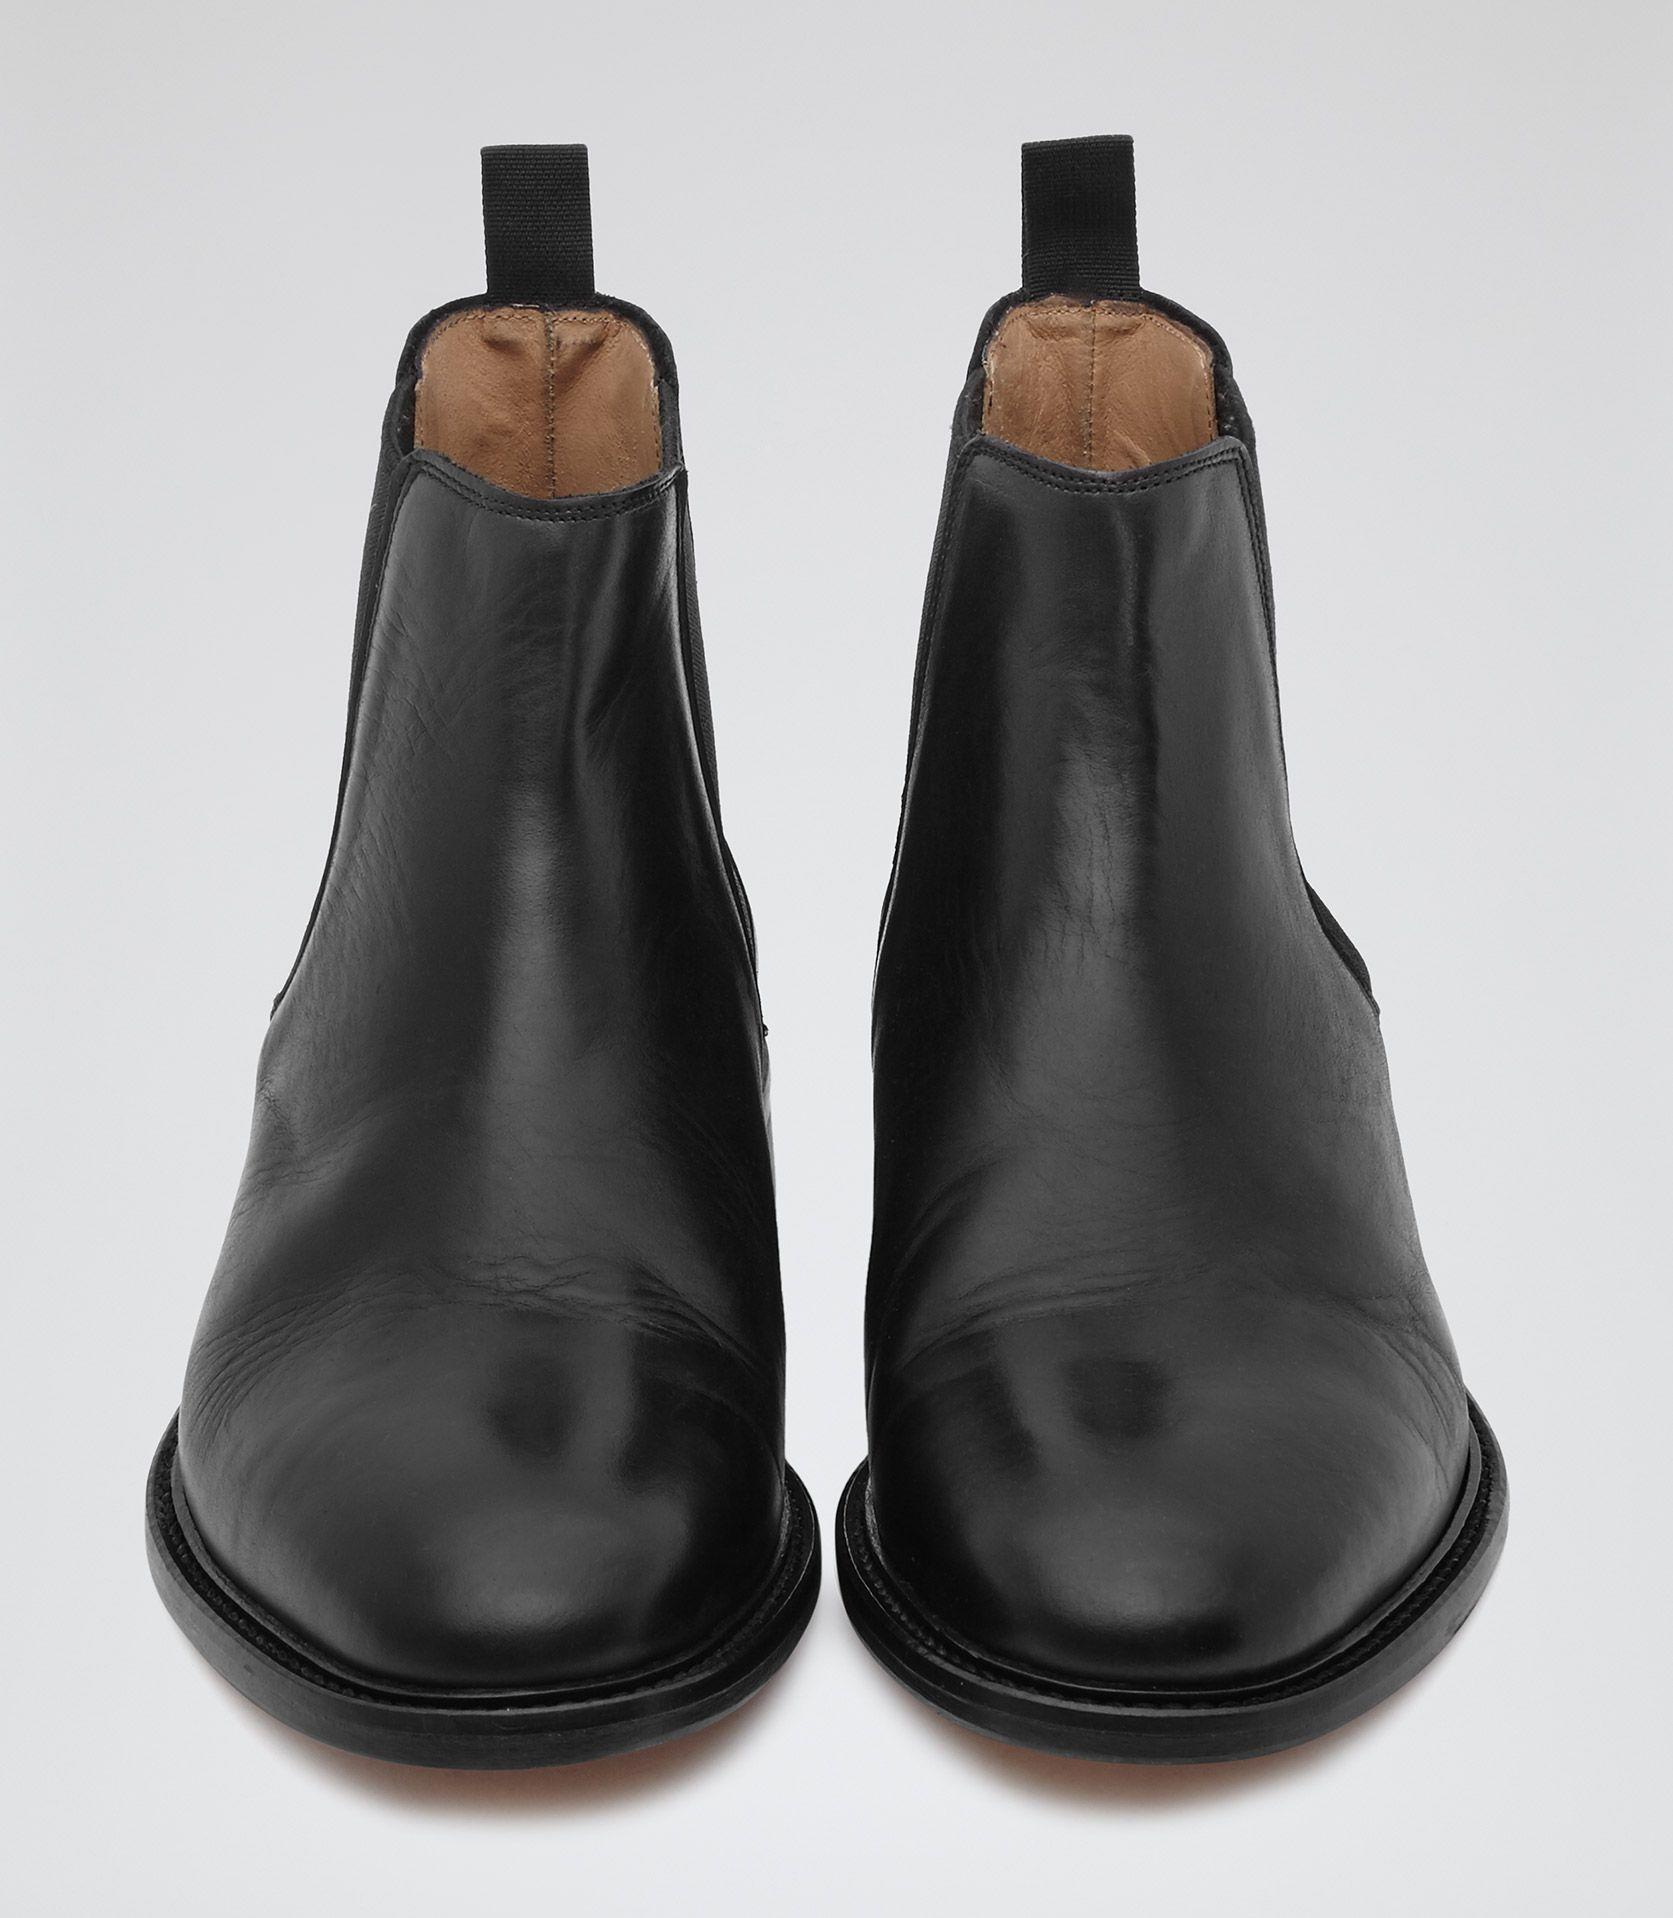 Reiss Tenor Suede - Suede Chelsea Boots in Dark Brown, Mens